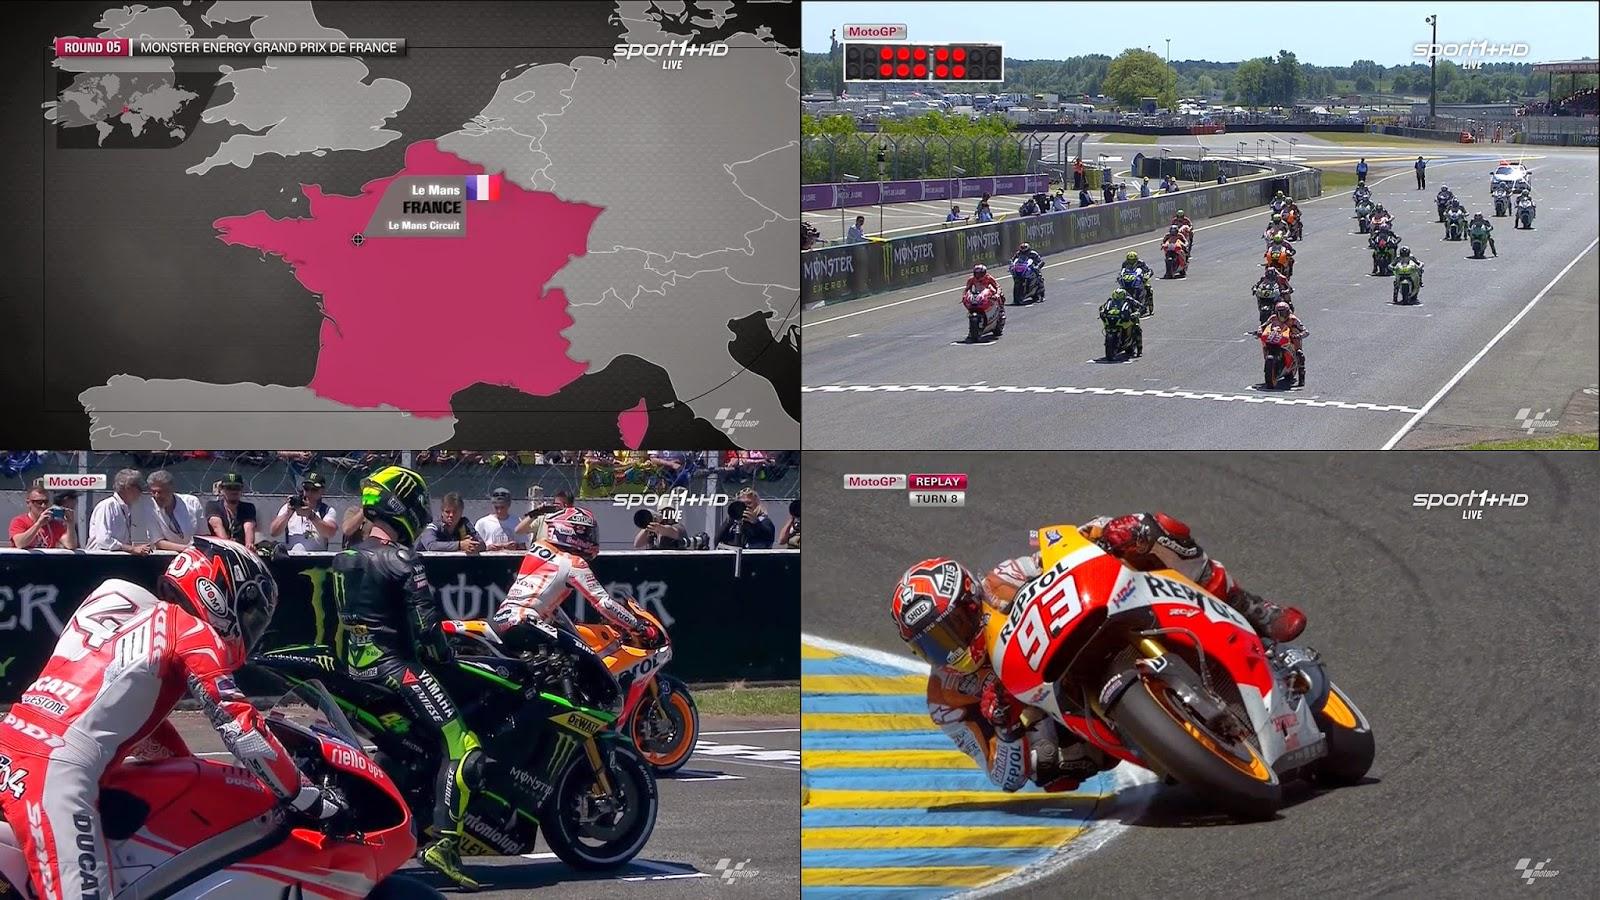 Motogp Jerez 2016 Rossi Juara Video Full Race By   MotoGP 2017 Info, Video, Points Table